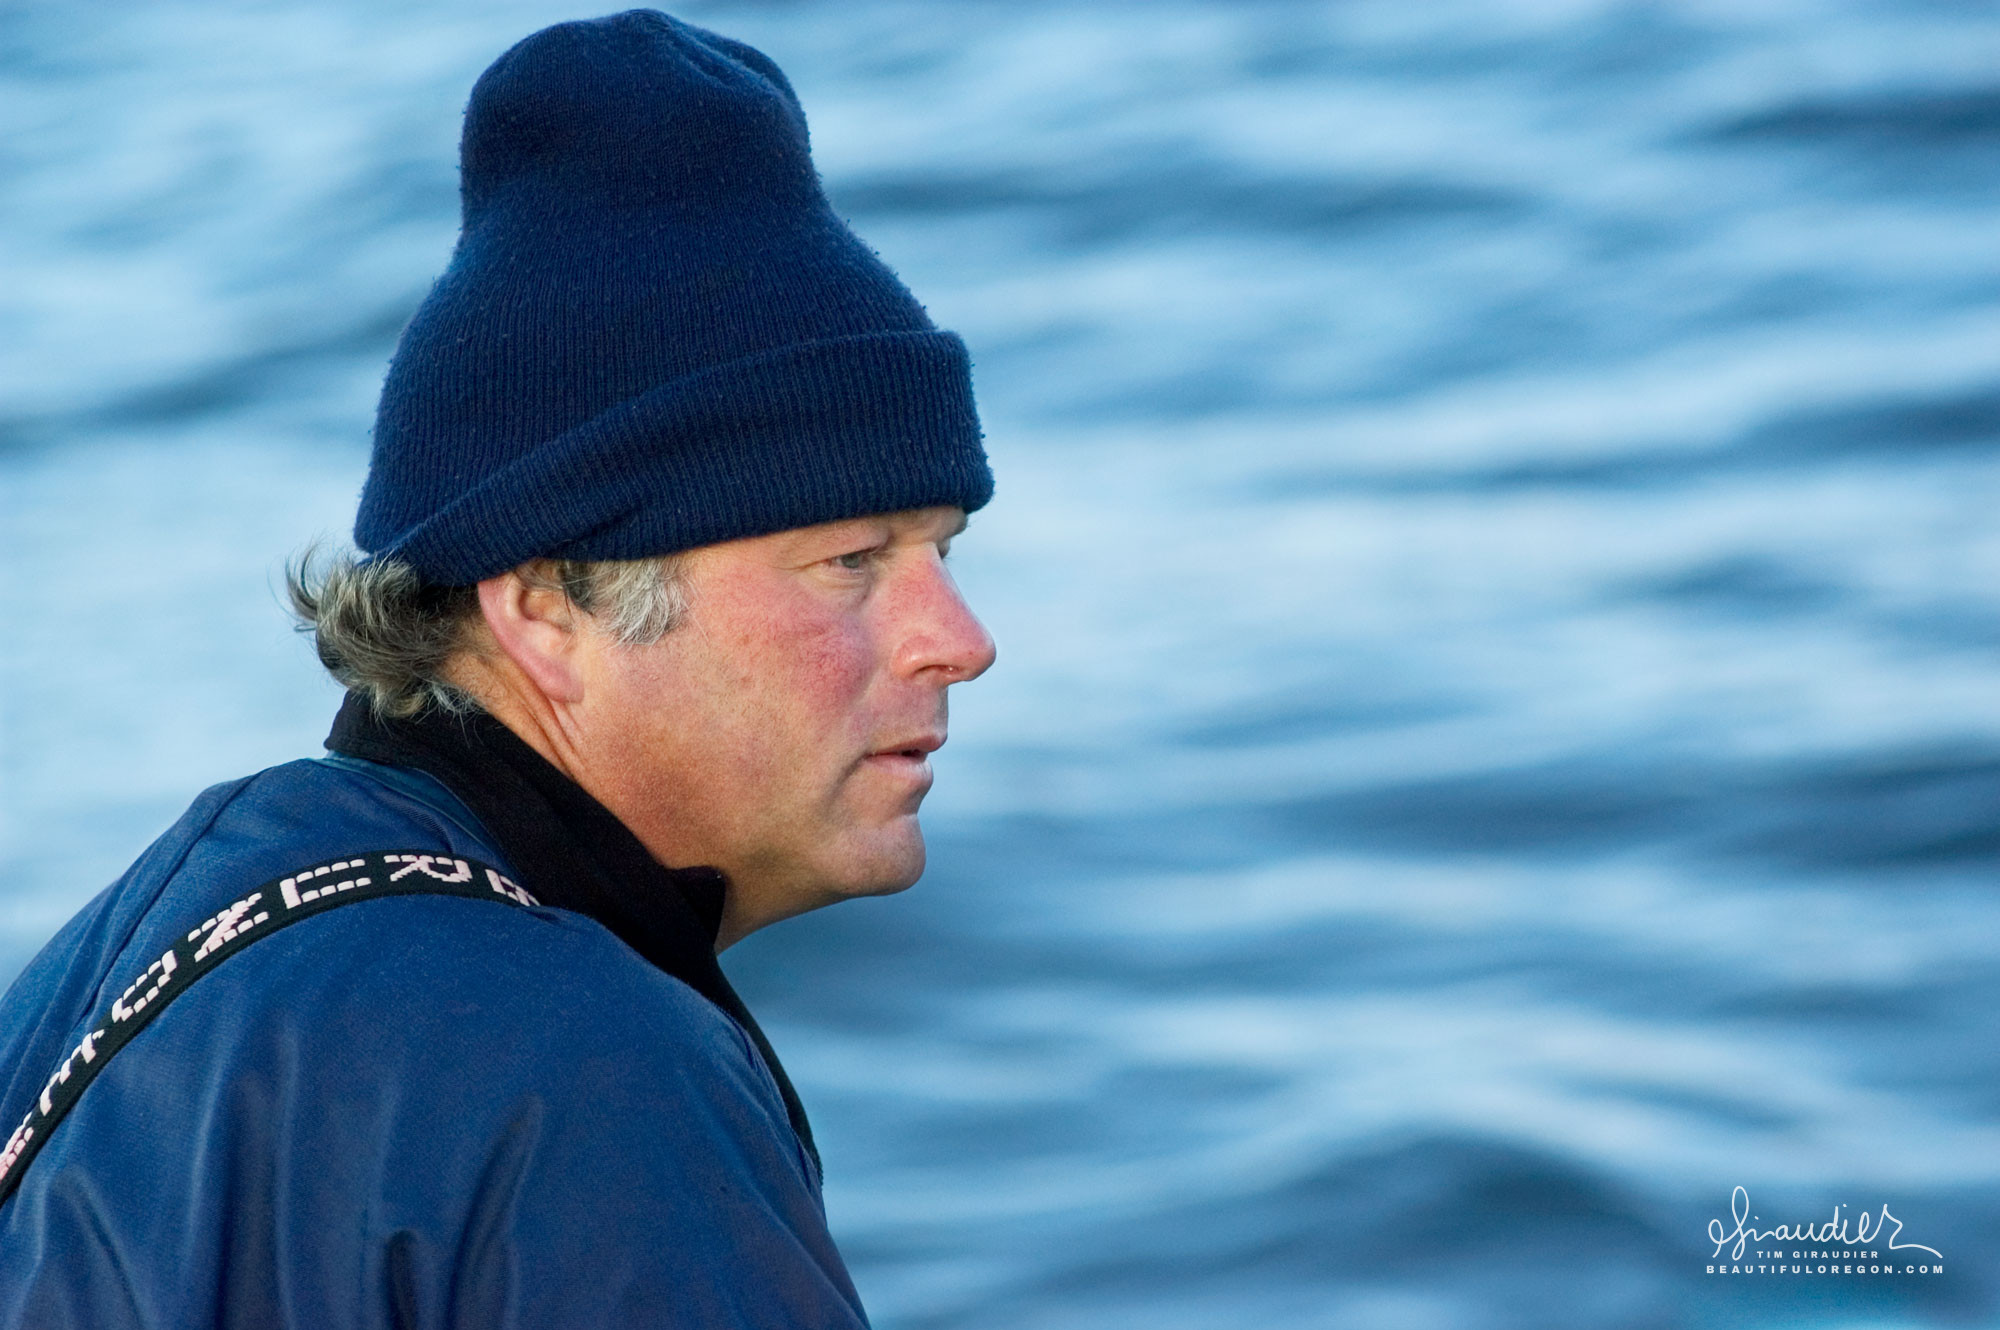 Capt. Rick Oltman F/V Cape Cleare. Southeast Alaska sustainable salmon troll fishery.